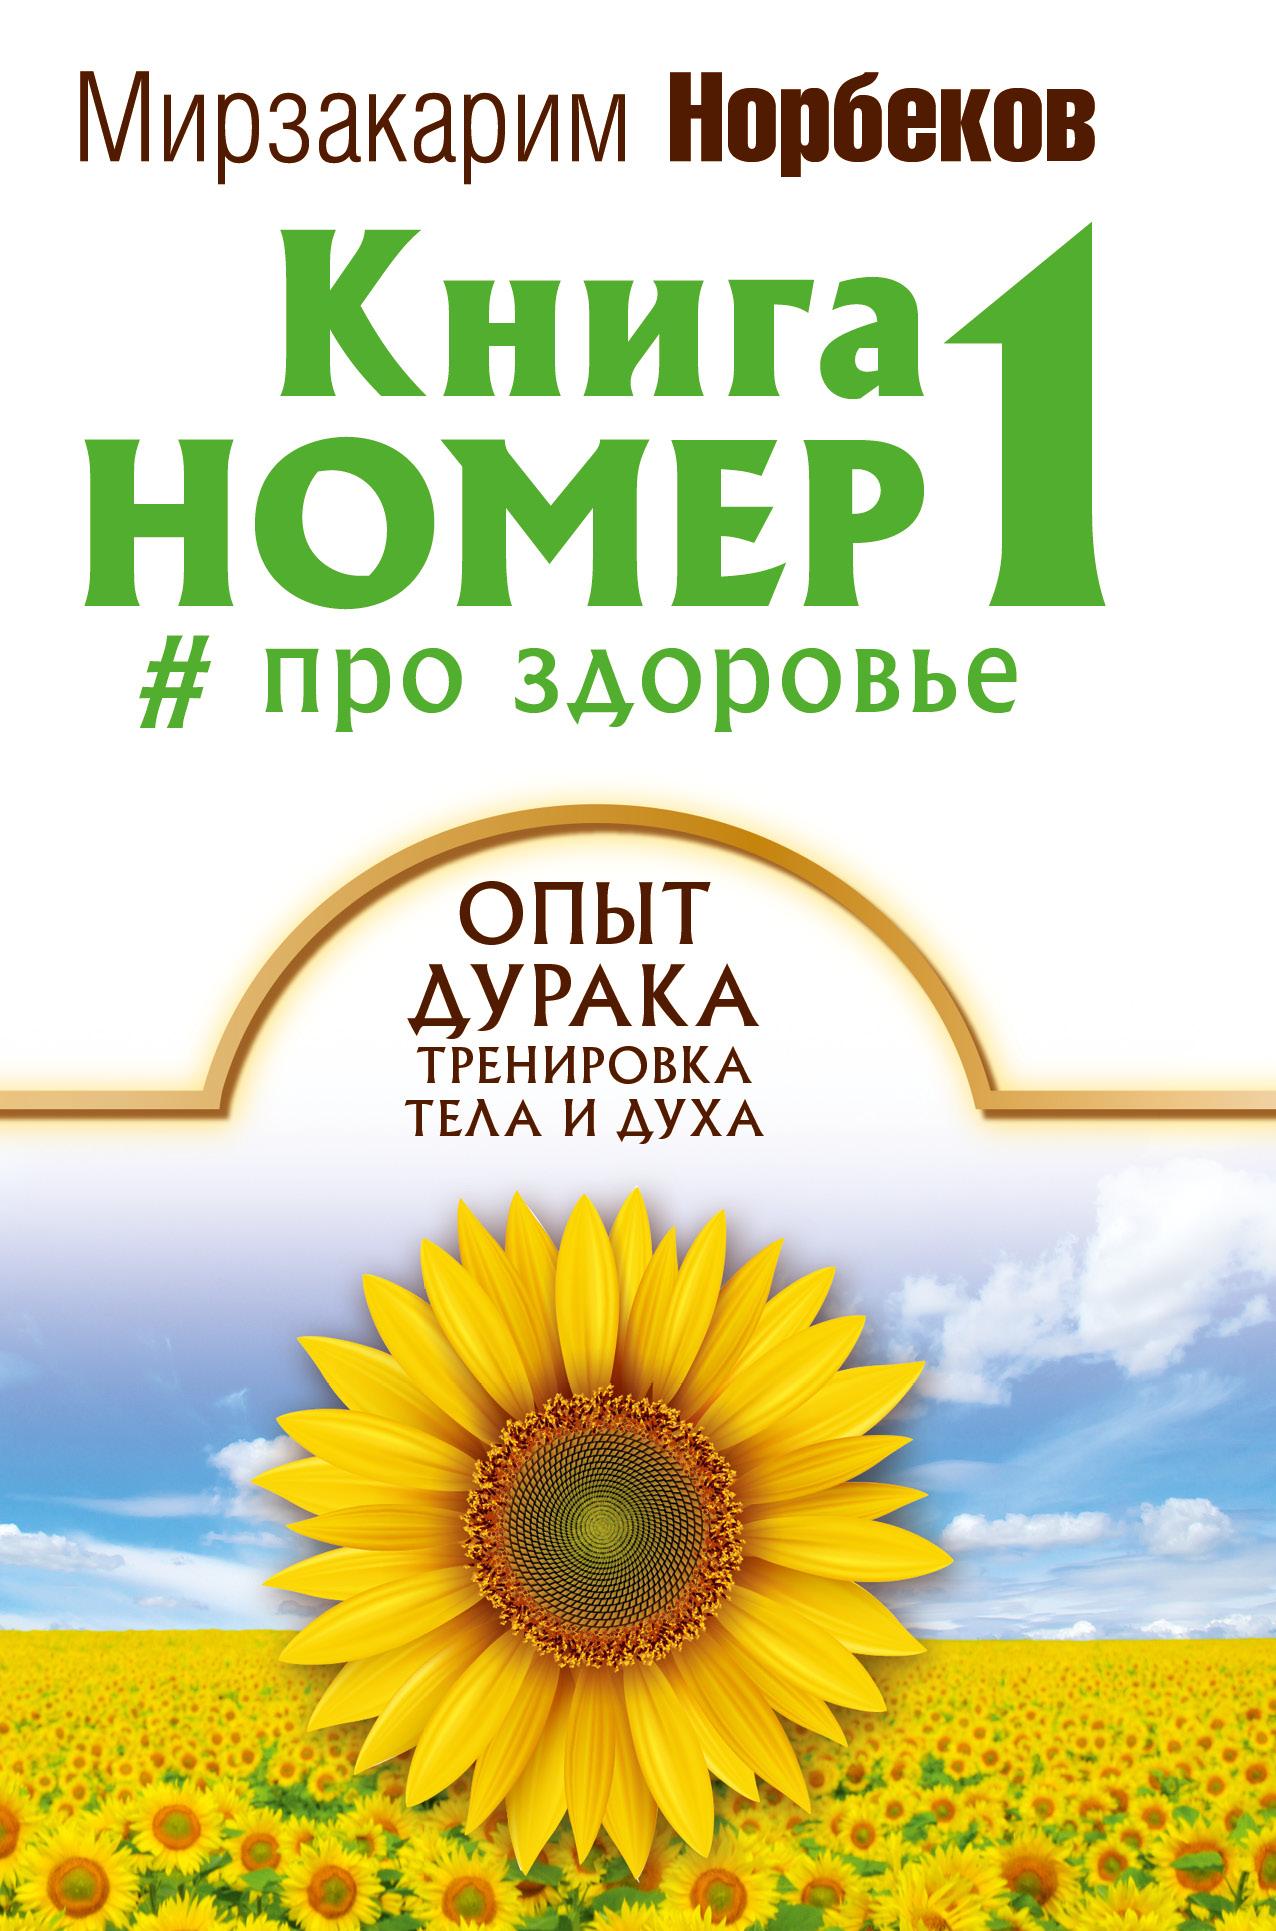 Норбеков М.С. Книга номер 1 # про здоровье норбеков мирзакарим санакулович победи болезни силой духа